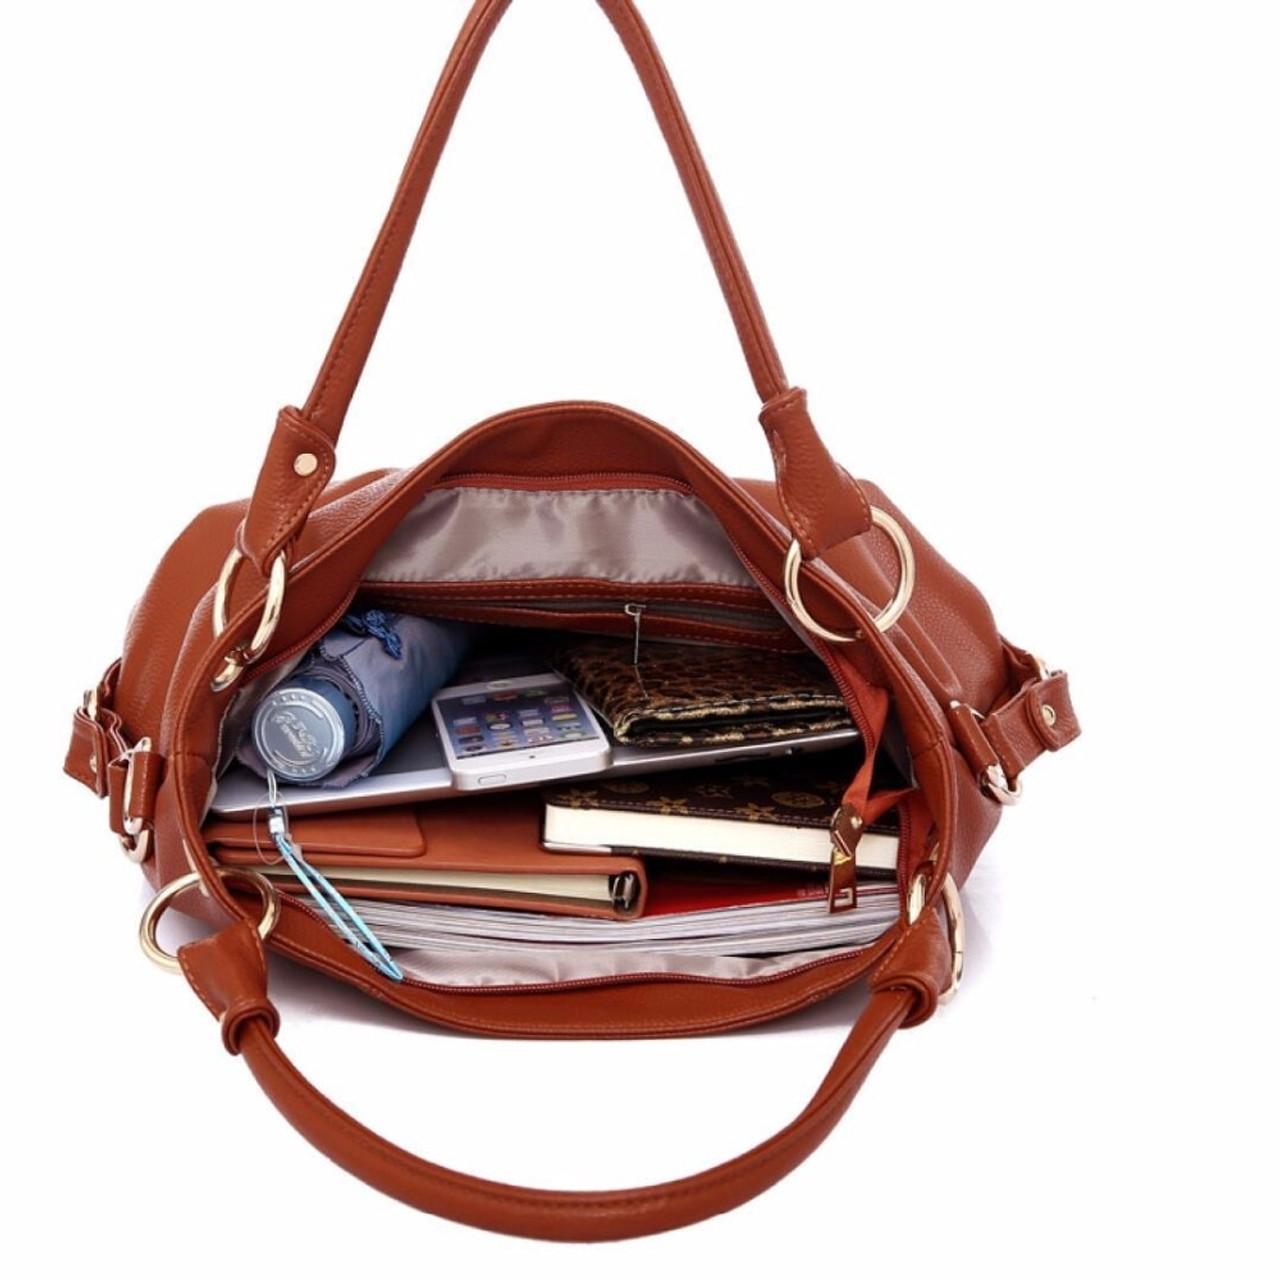 da42dd1577 ... New Genuine Leather Tassel Handbag Women Messenger Bags Ladies Handbags  Women Shoulder Crossbody Bags Bolsa Feminina ...